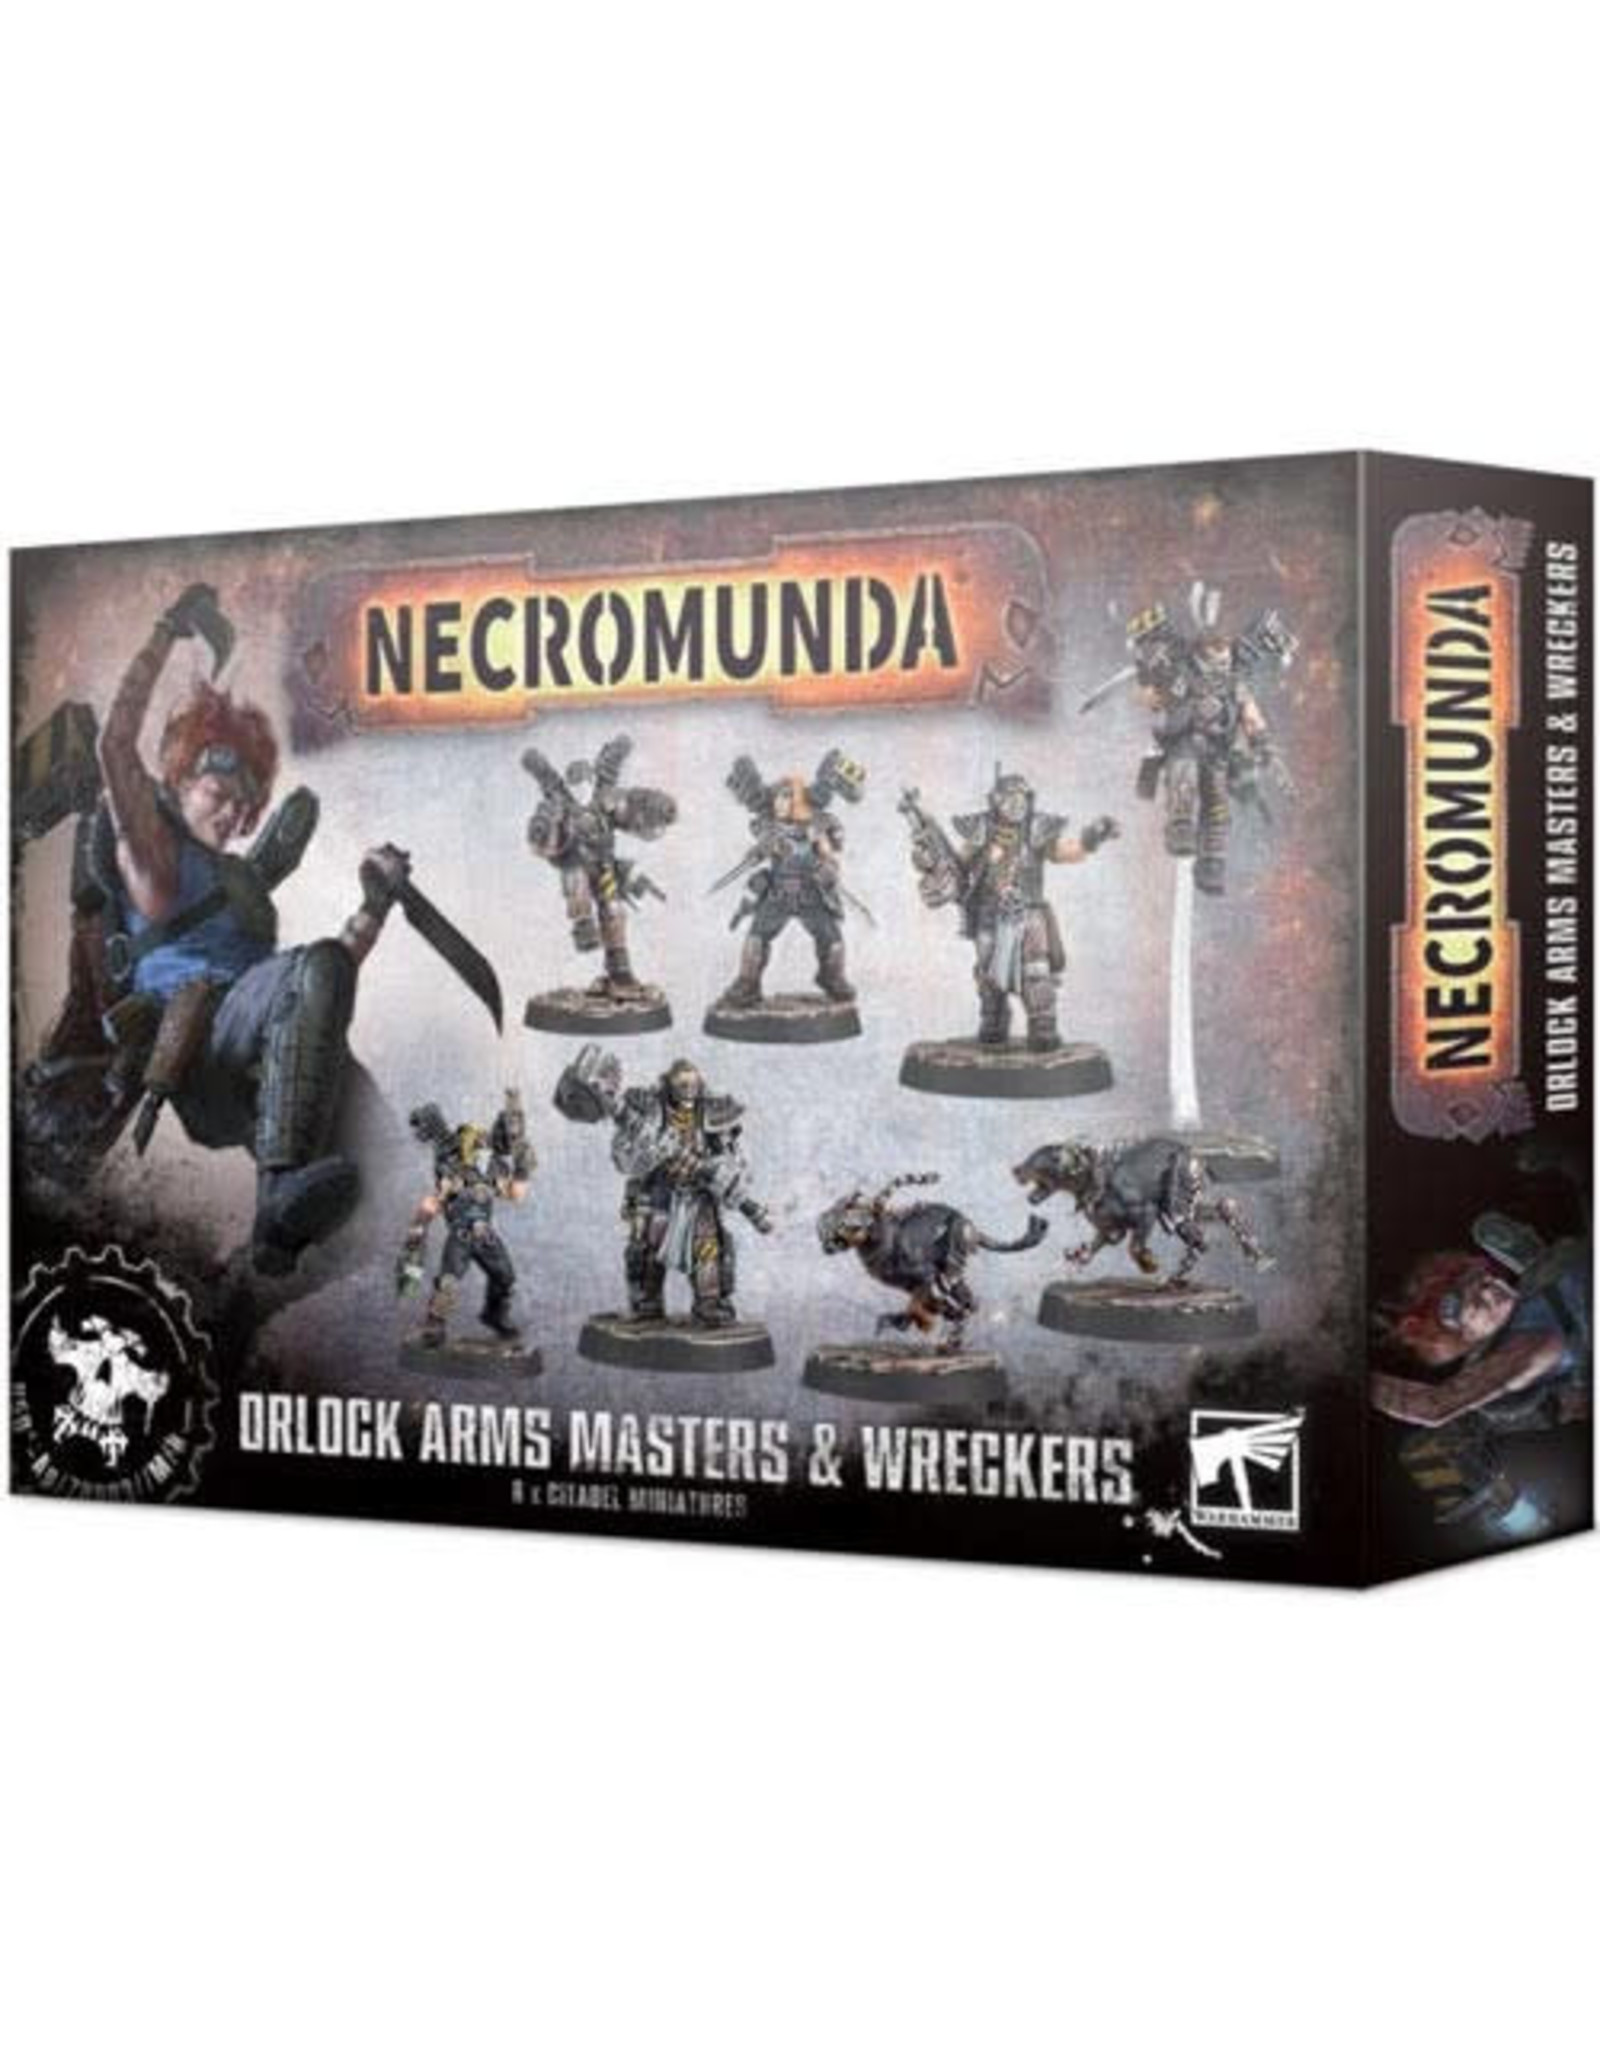 Necromunda Orlock Arms Master and Wreckers